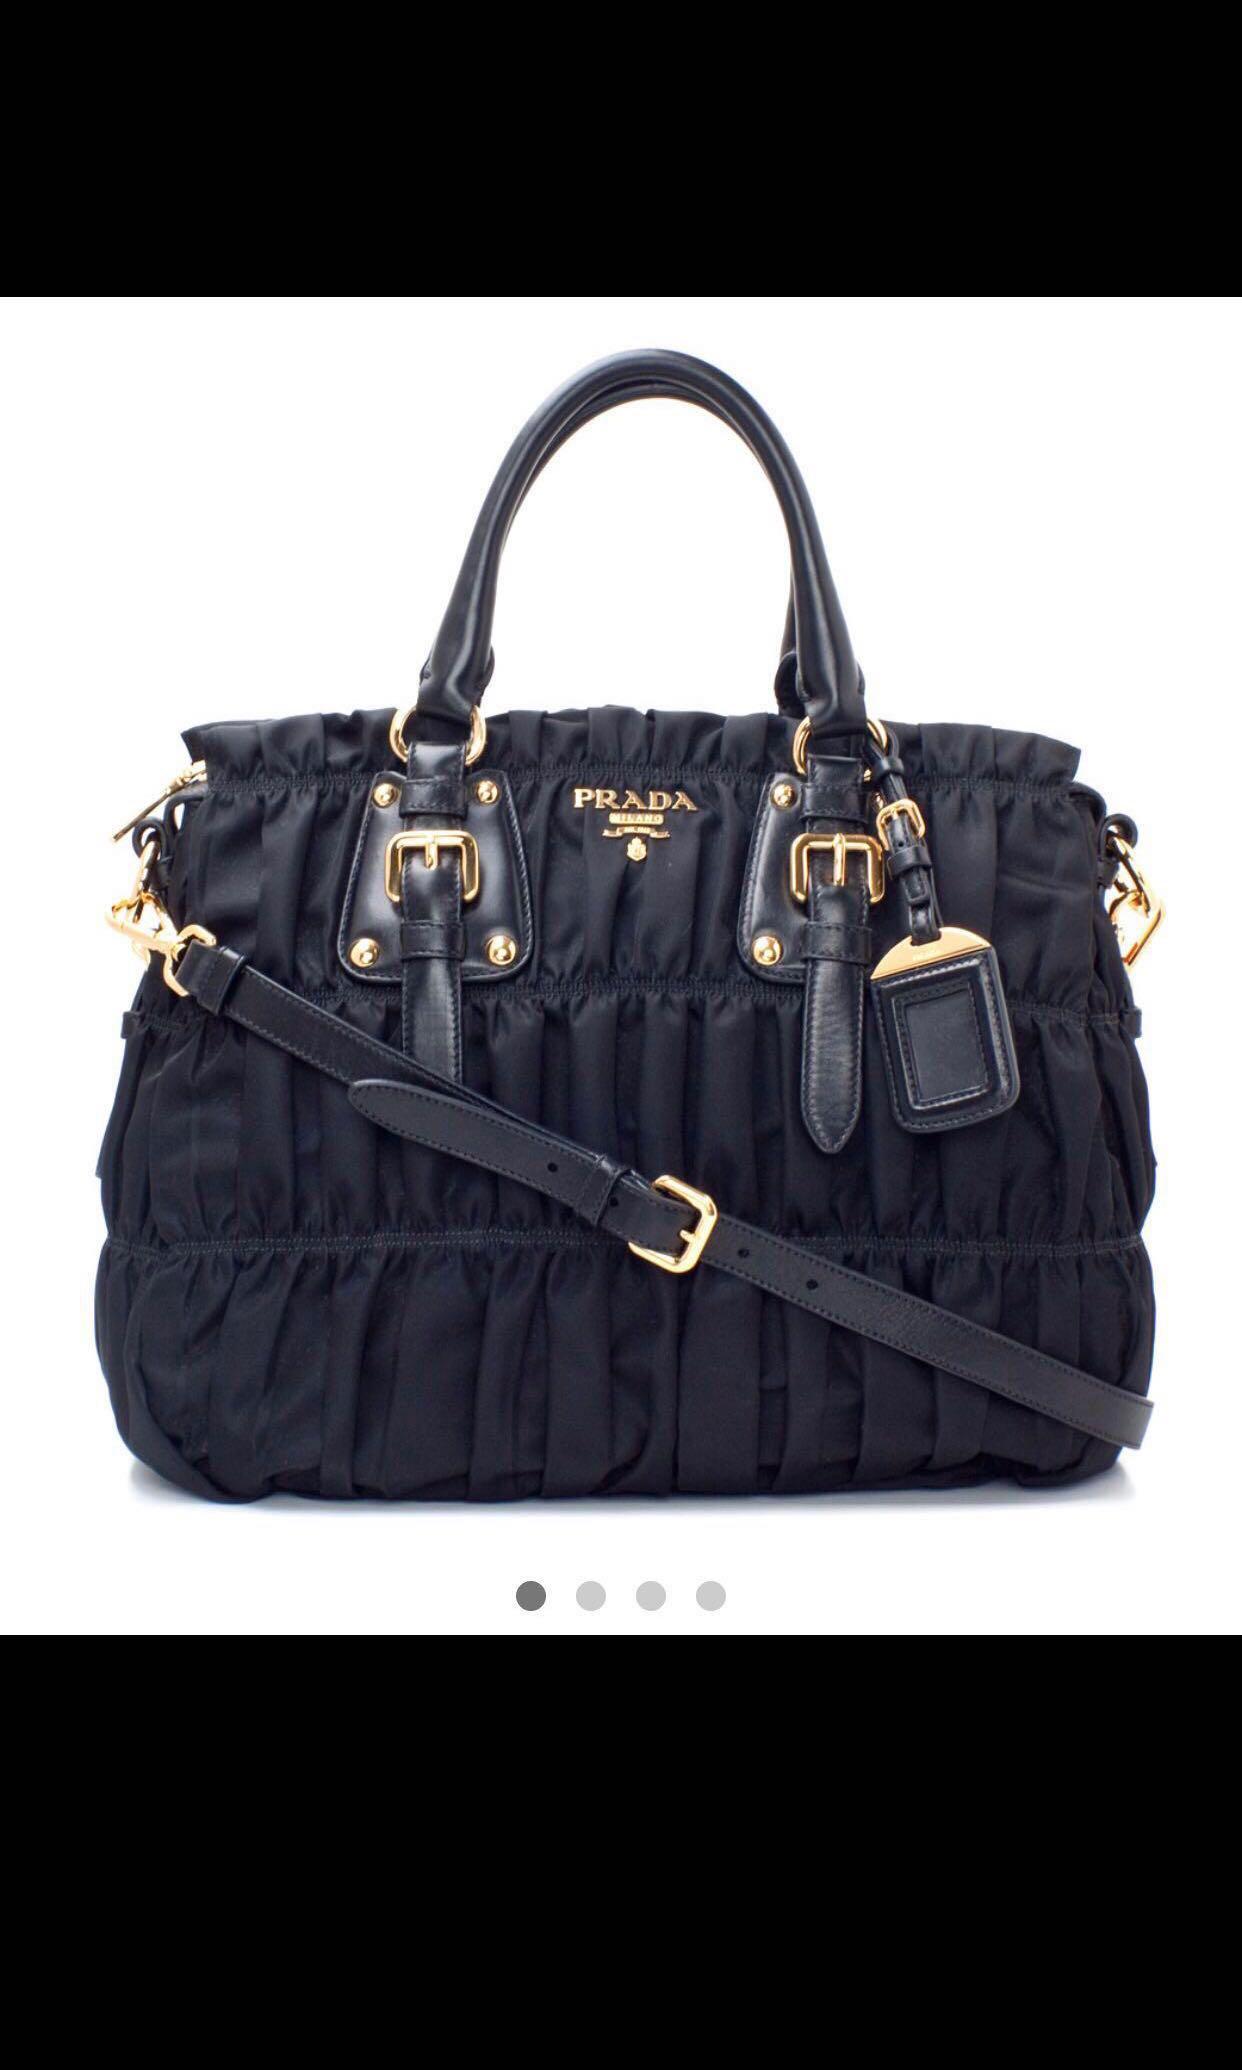 4d4016f73c Prada Tessuto Gaufre Tote Bag